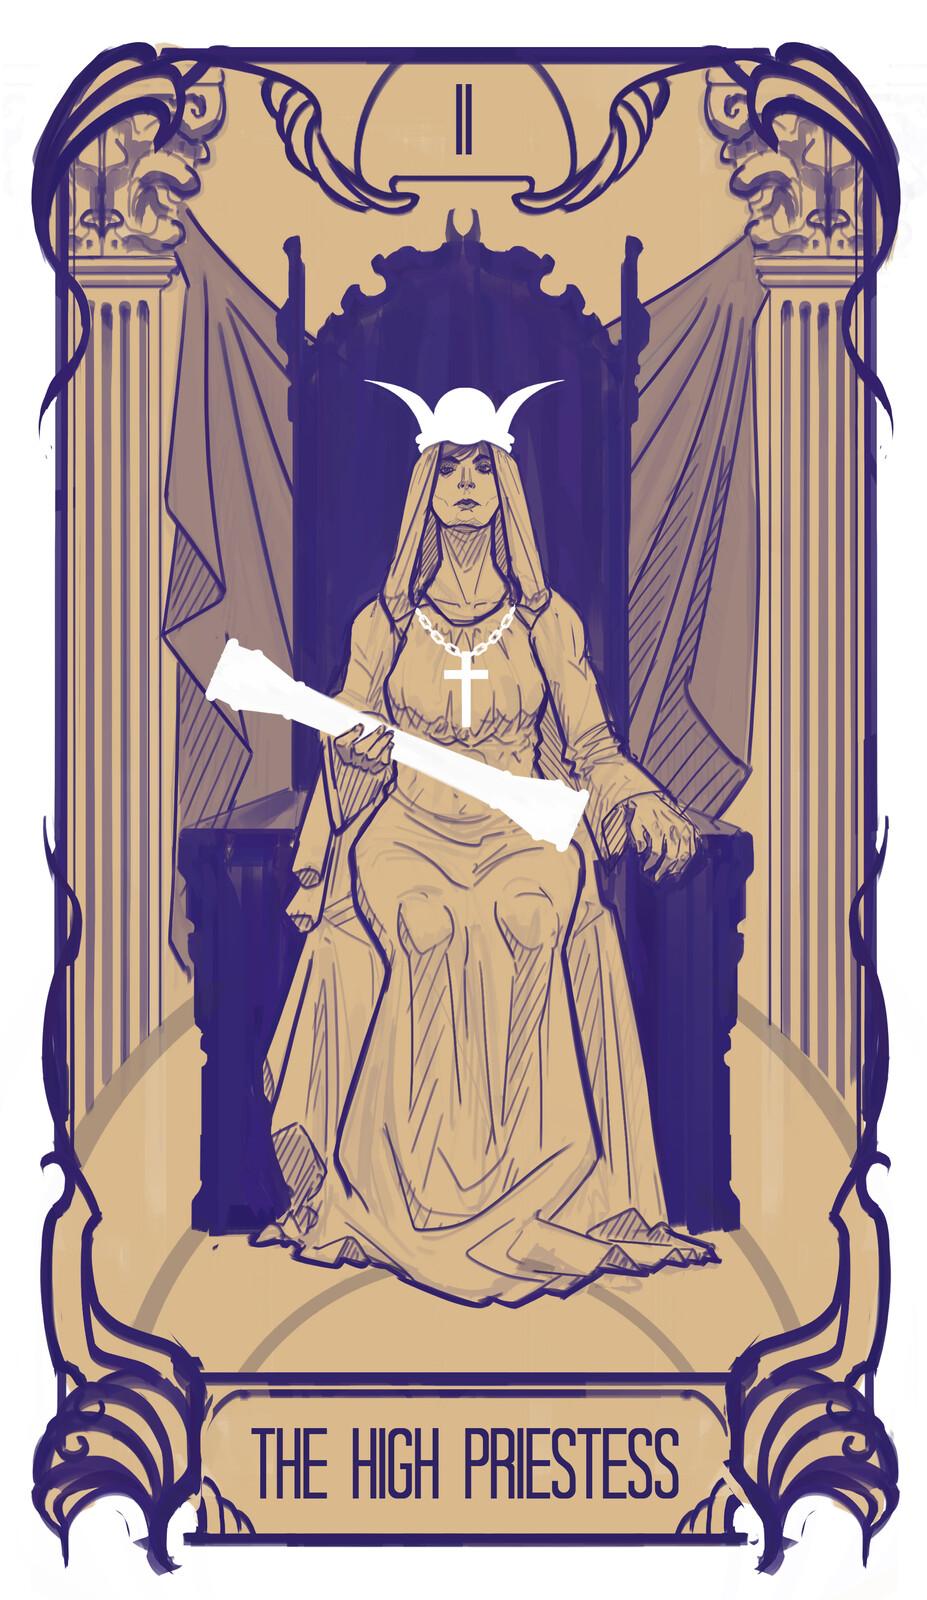 2. The high priestess